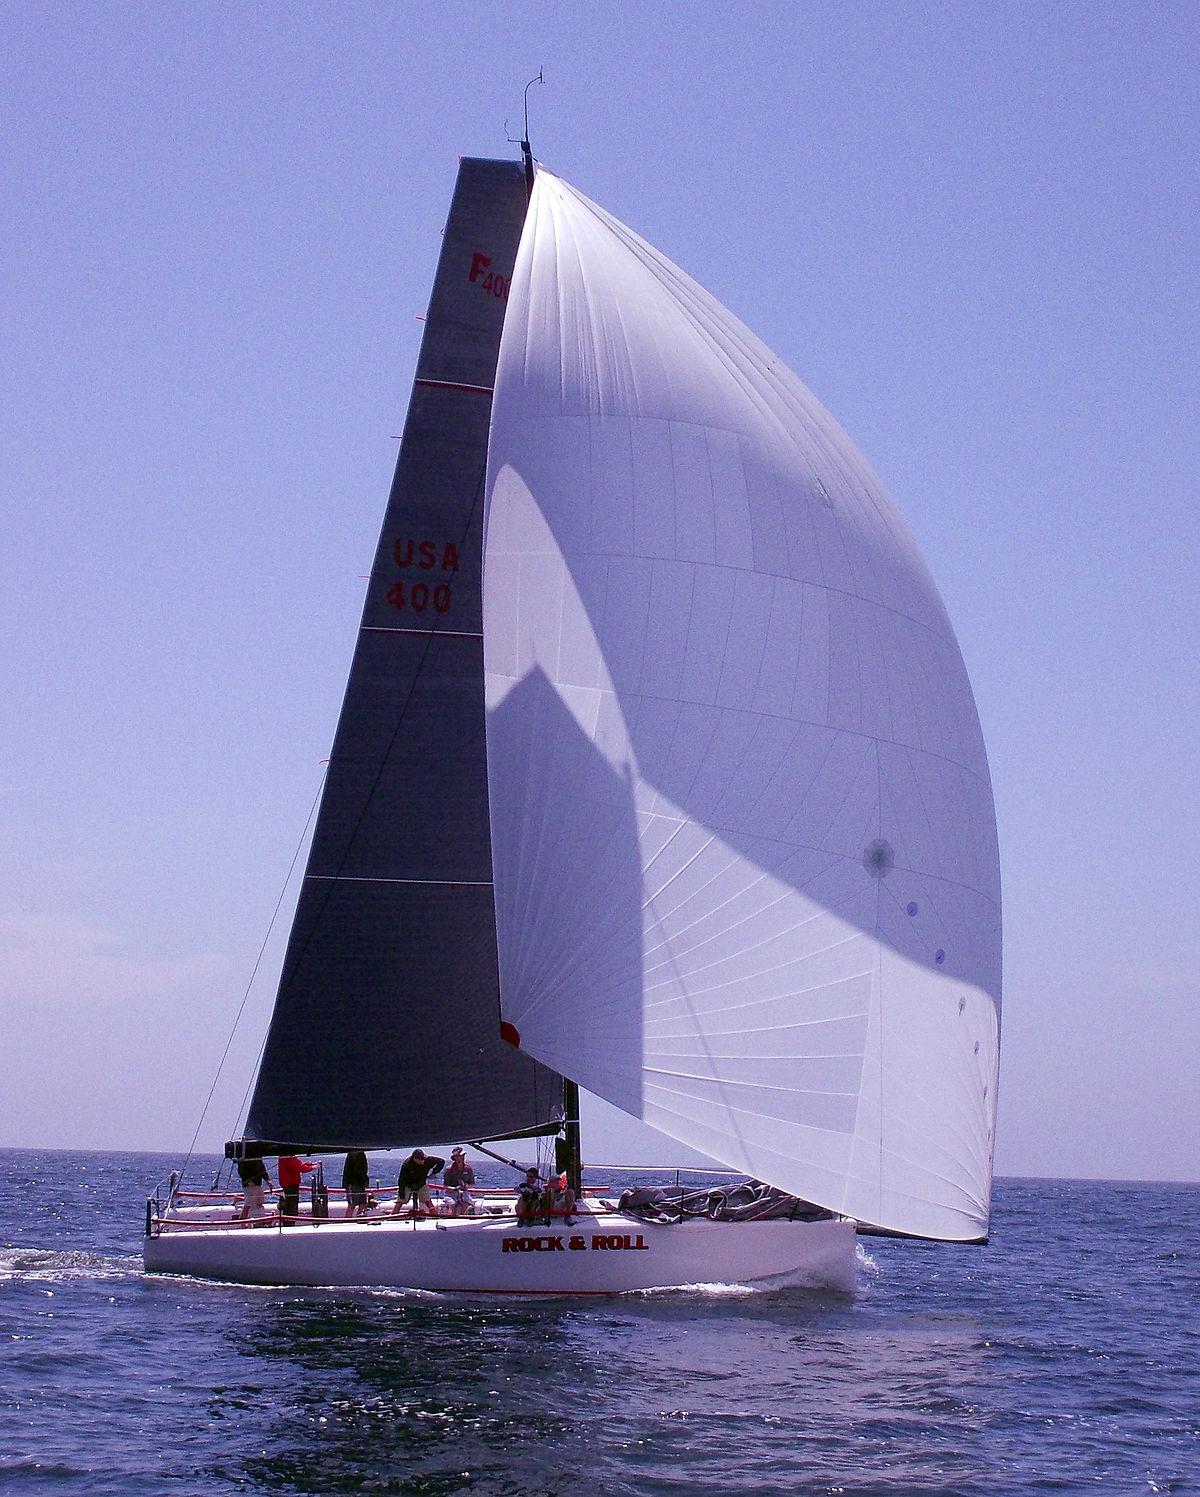 Farr yacht design wikipedia for Yacht dekoration